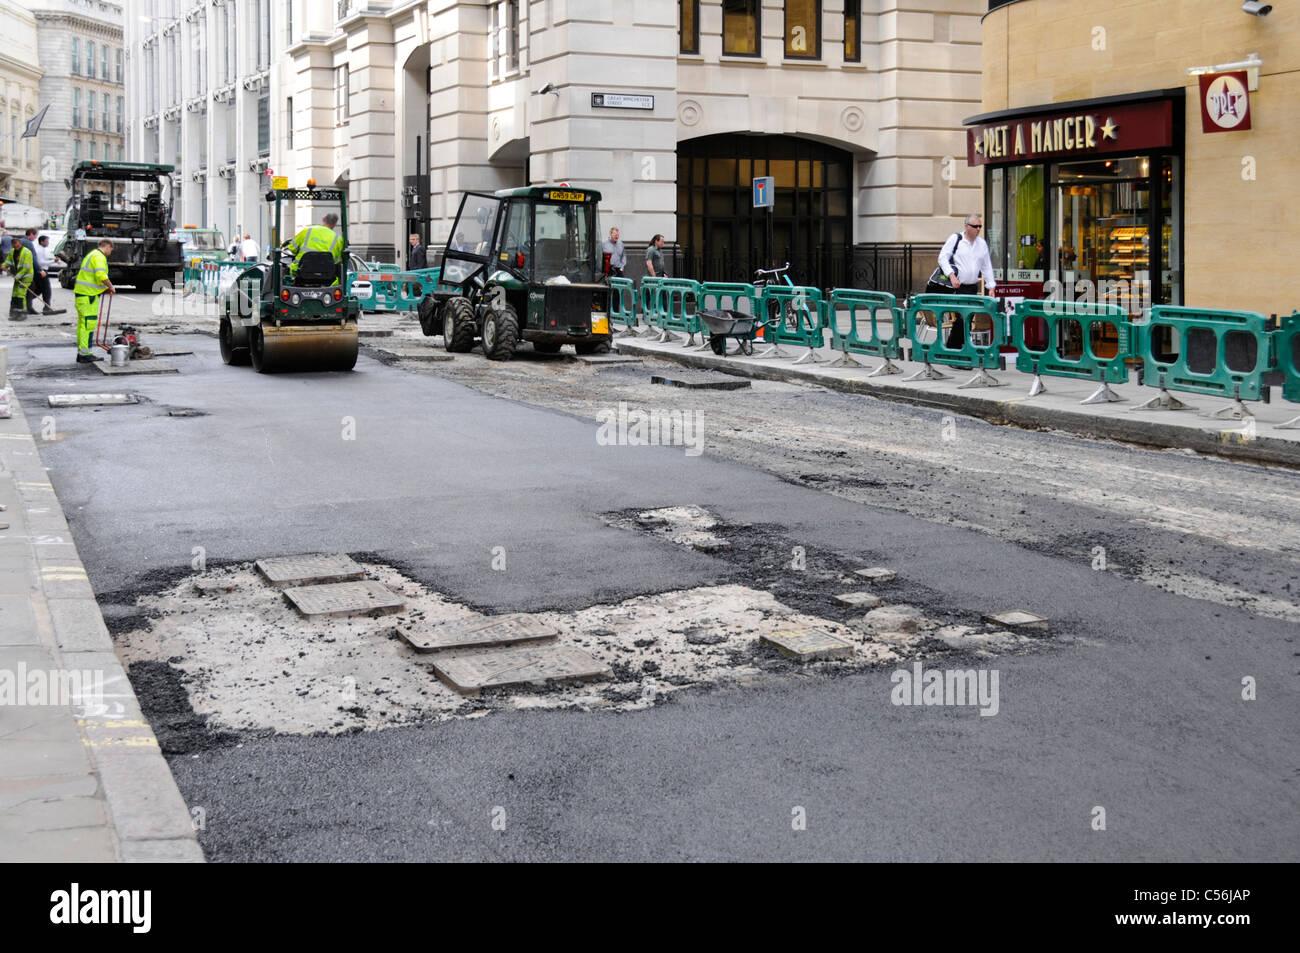 Street scene road works machines workmen & work in progress resurfacing worn out tarmac road in City of London - Stock Image